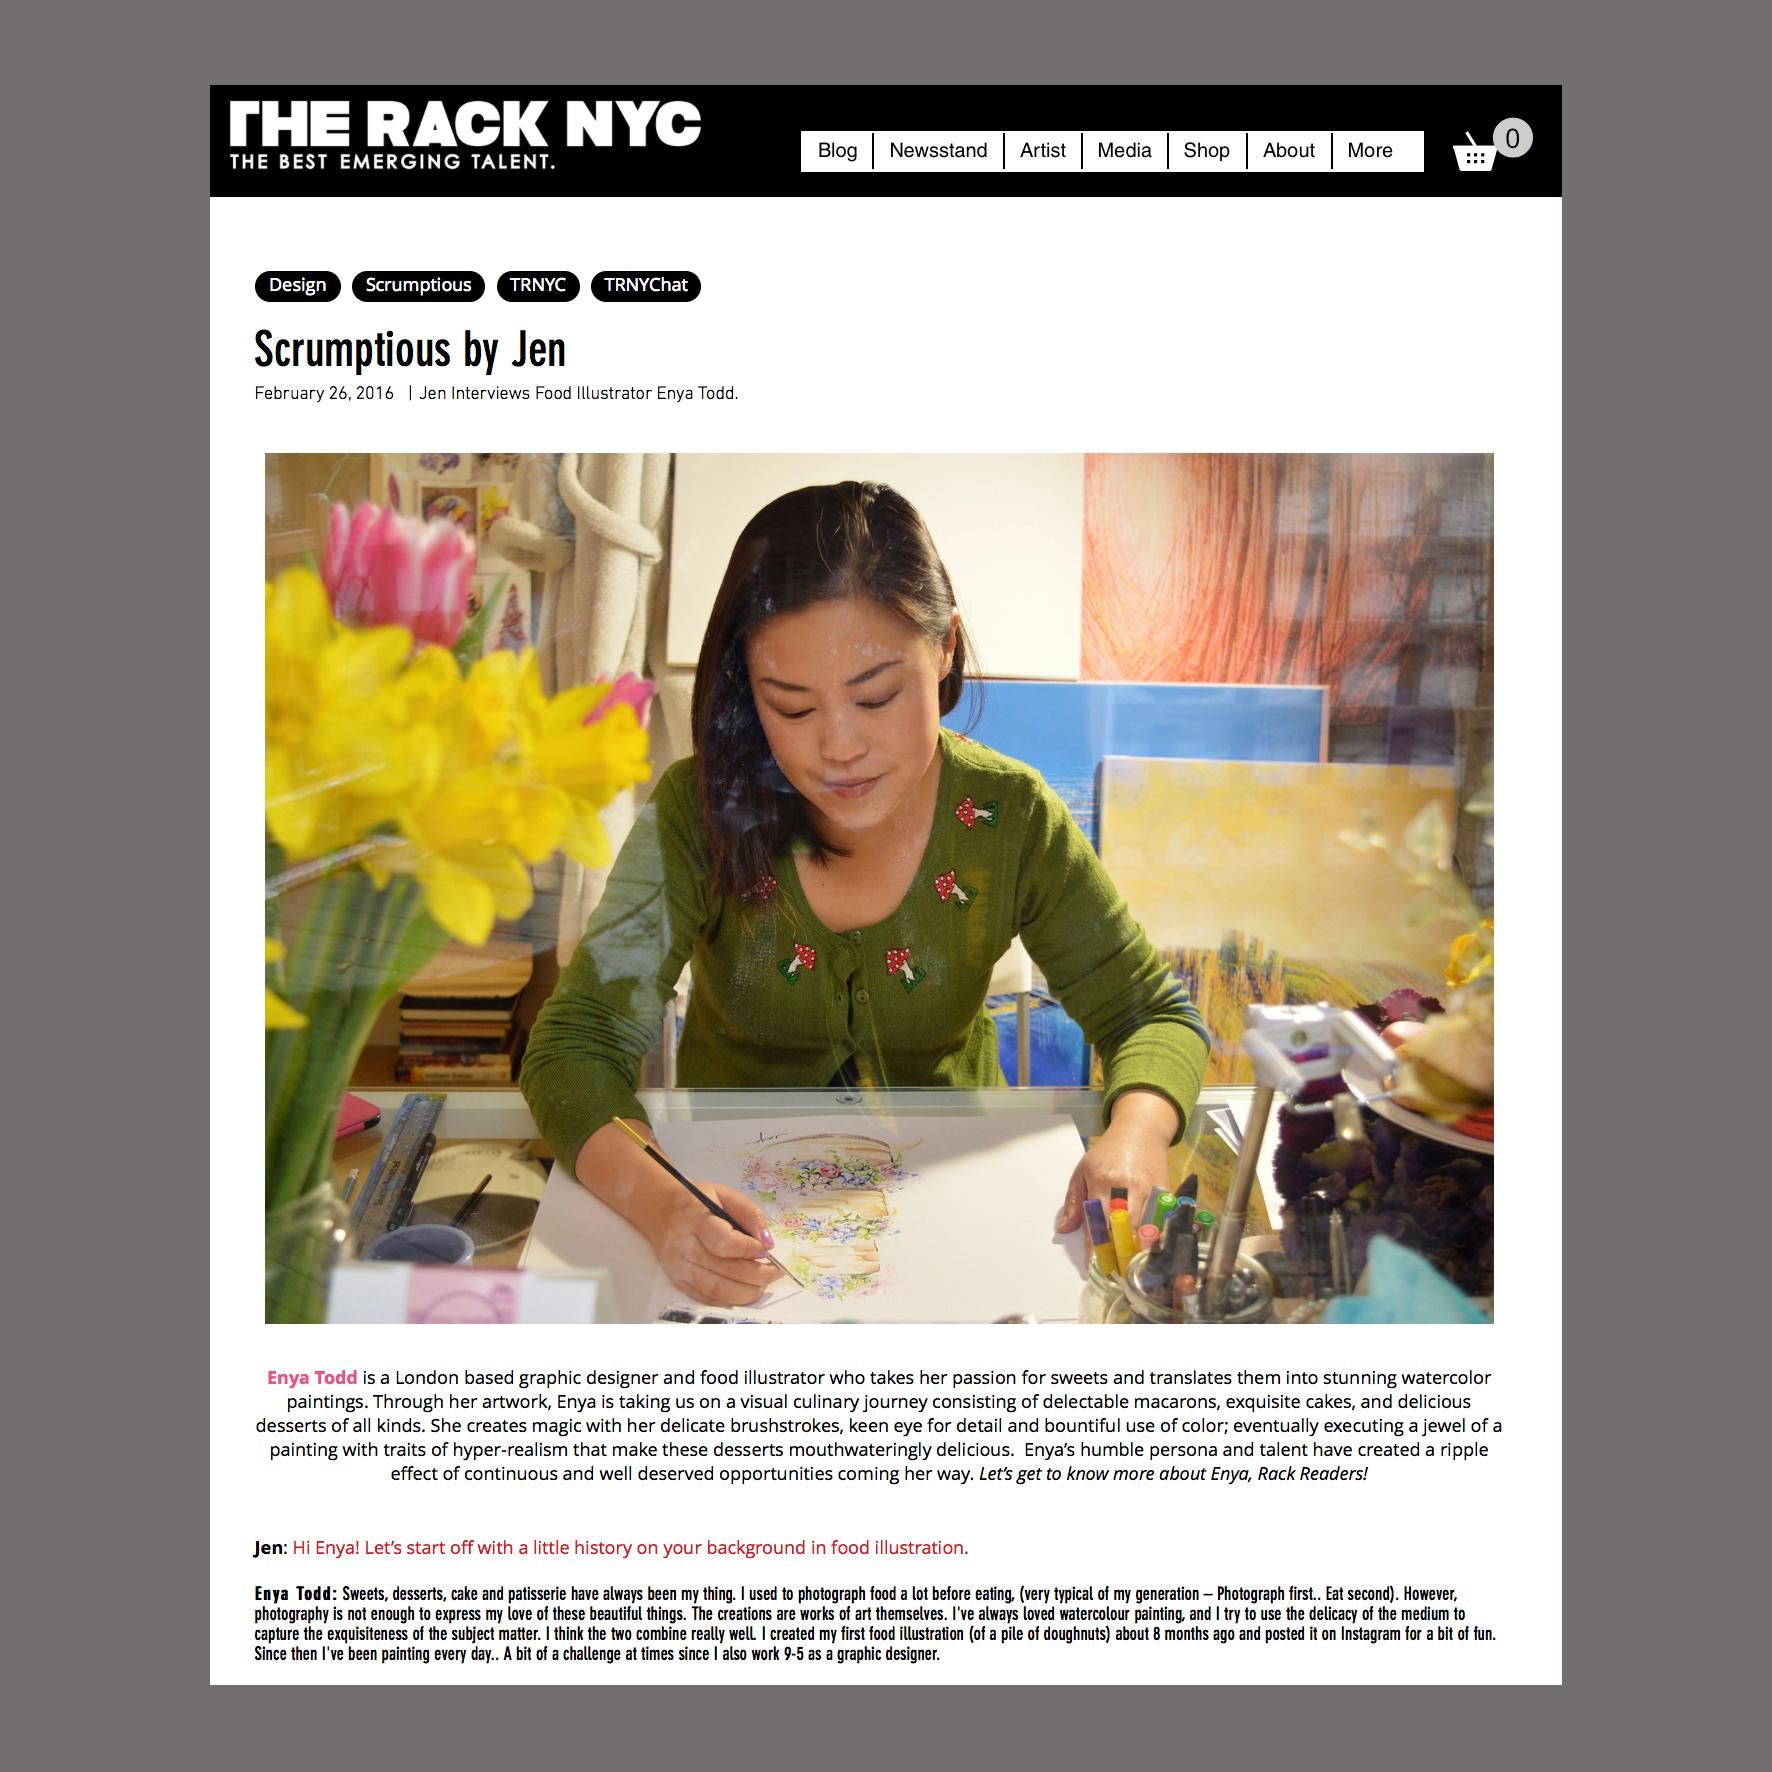 THE RACK NYC